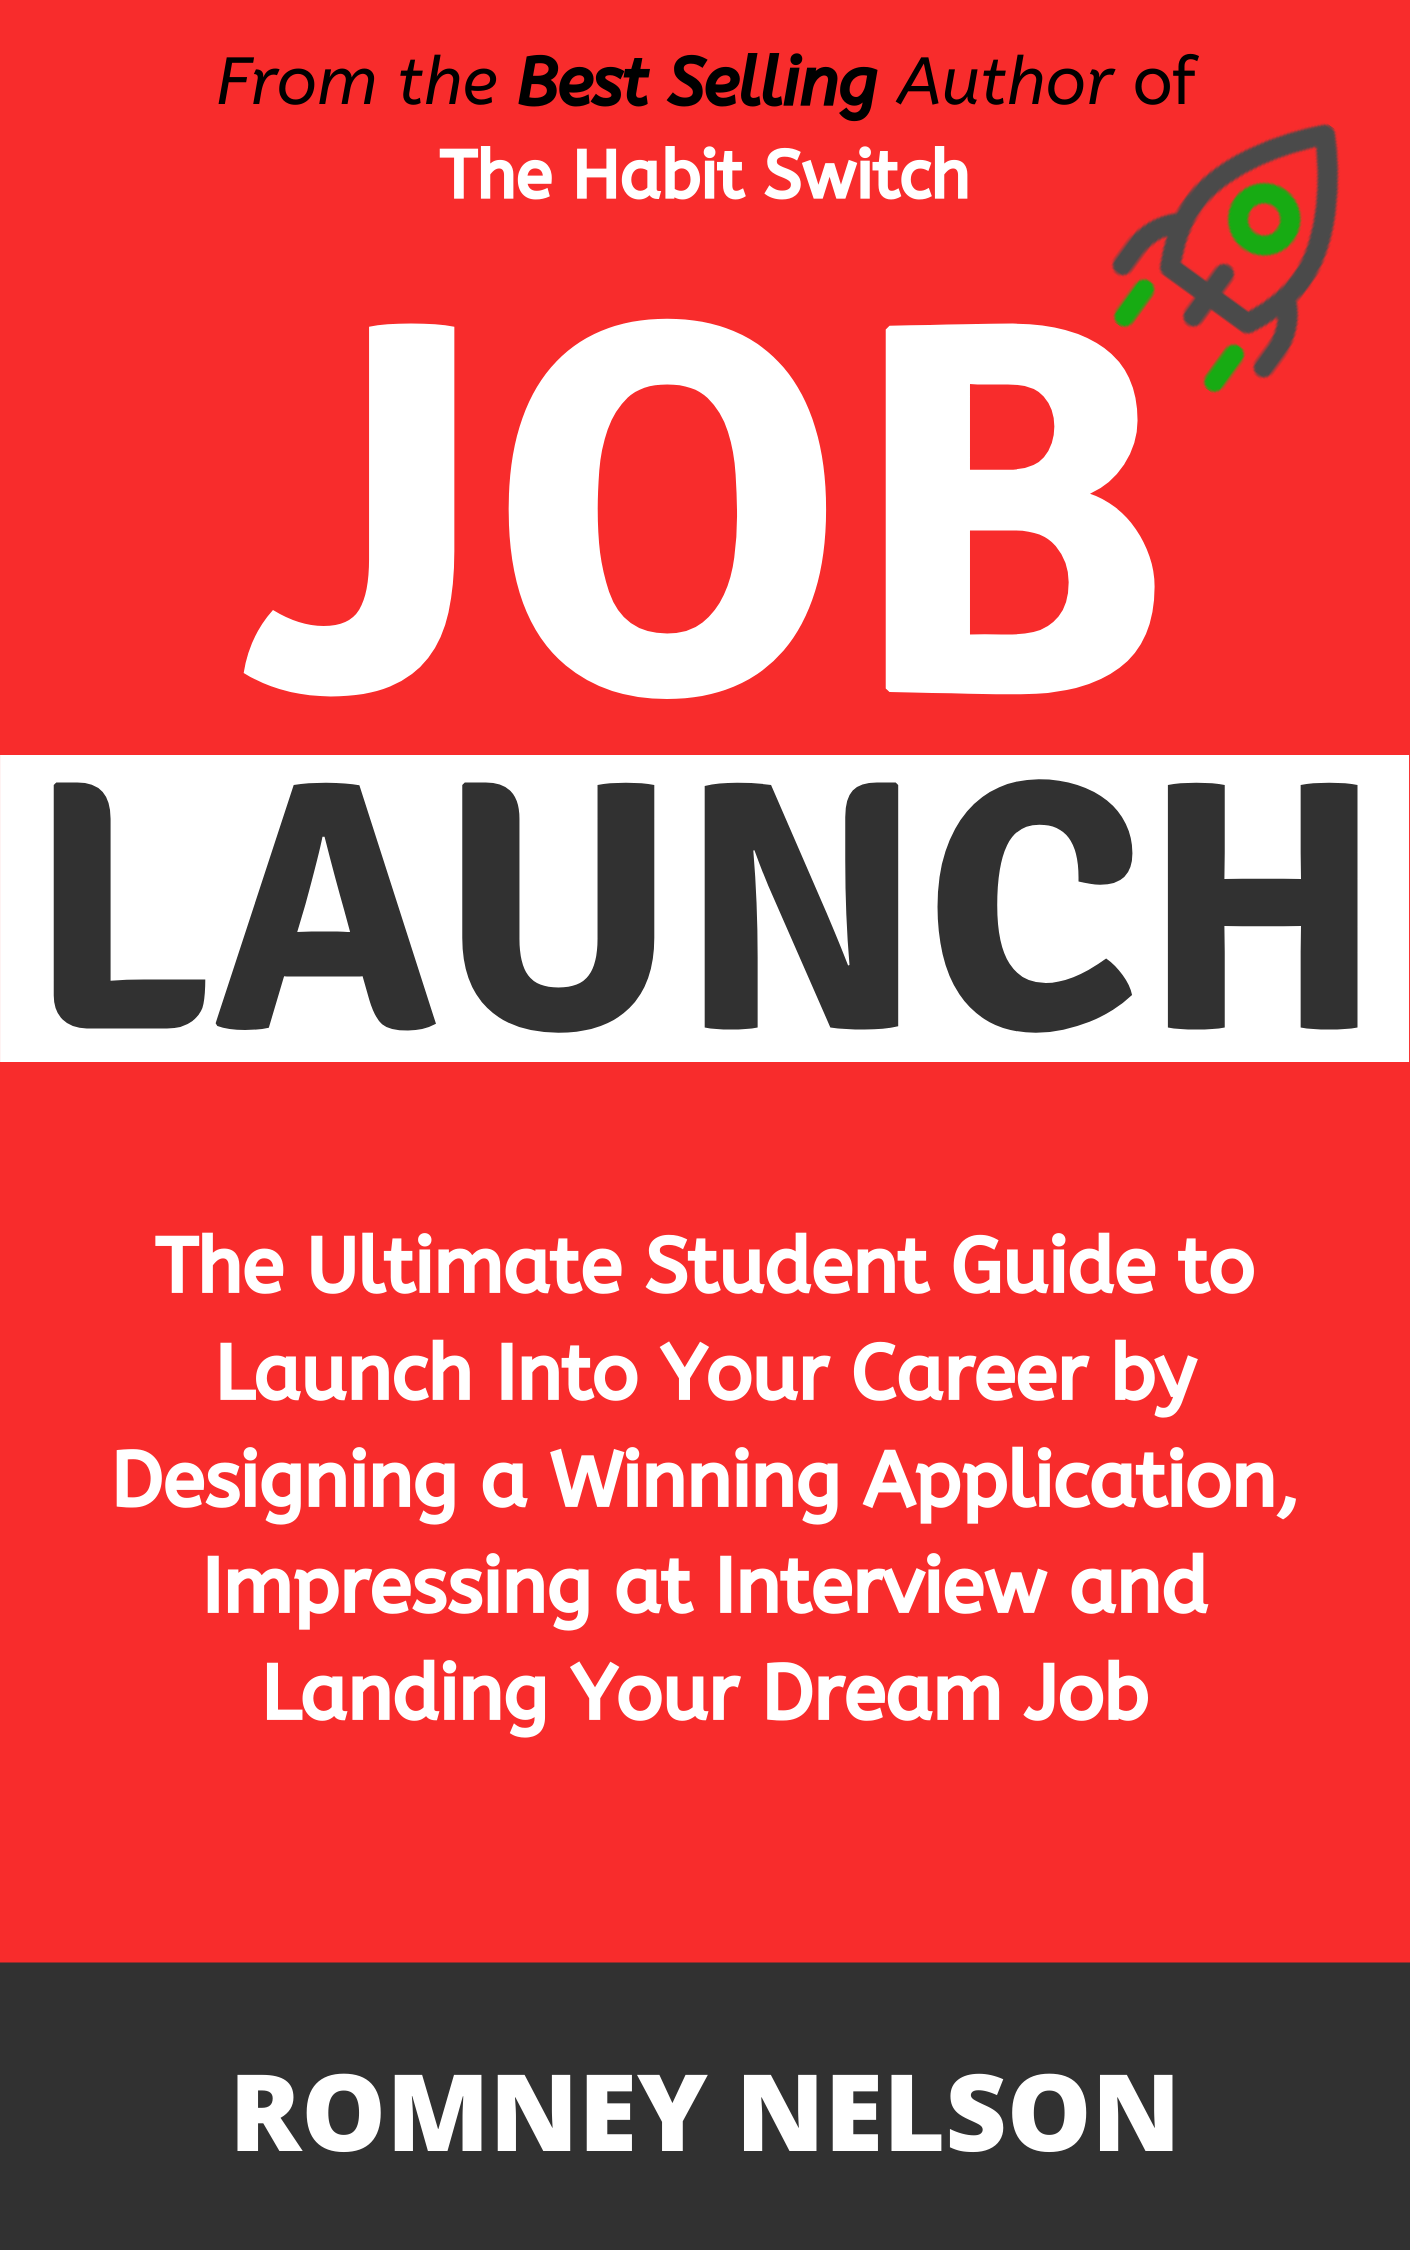 Job Launch by Romney Nelson